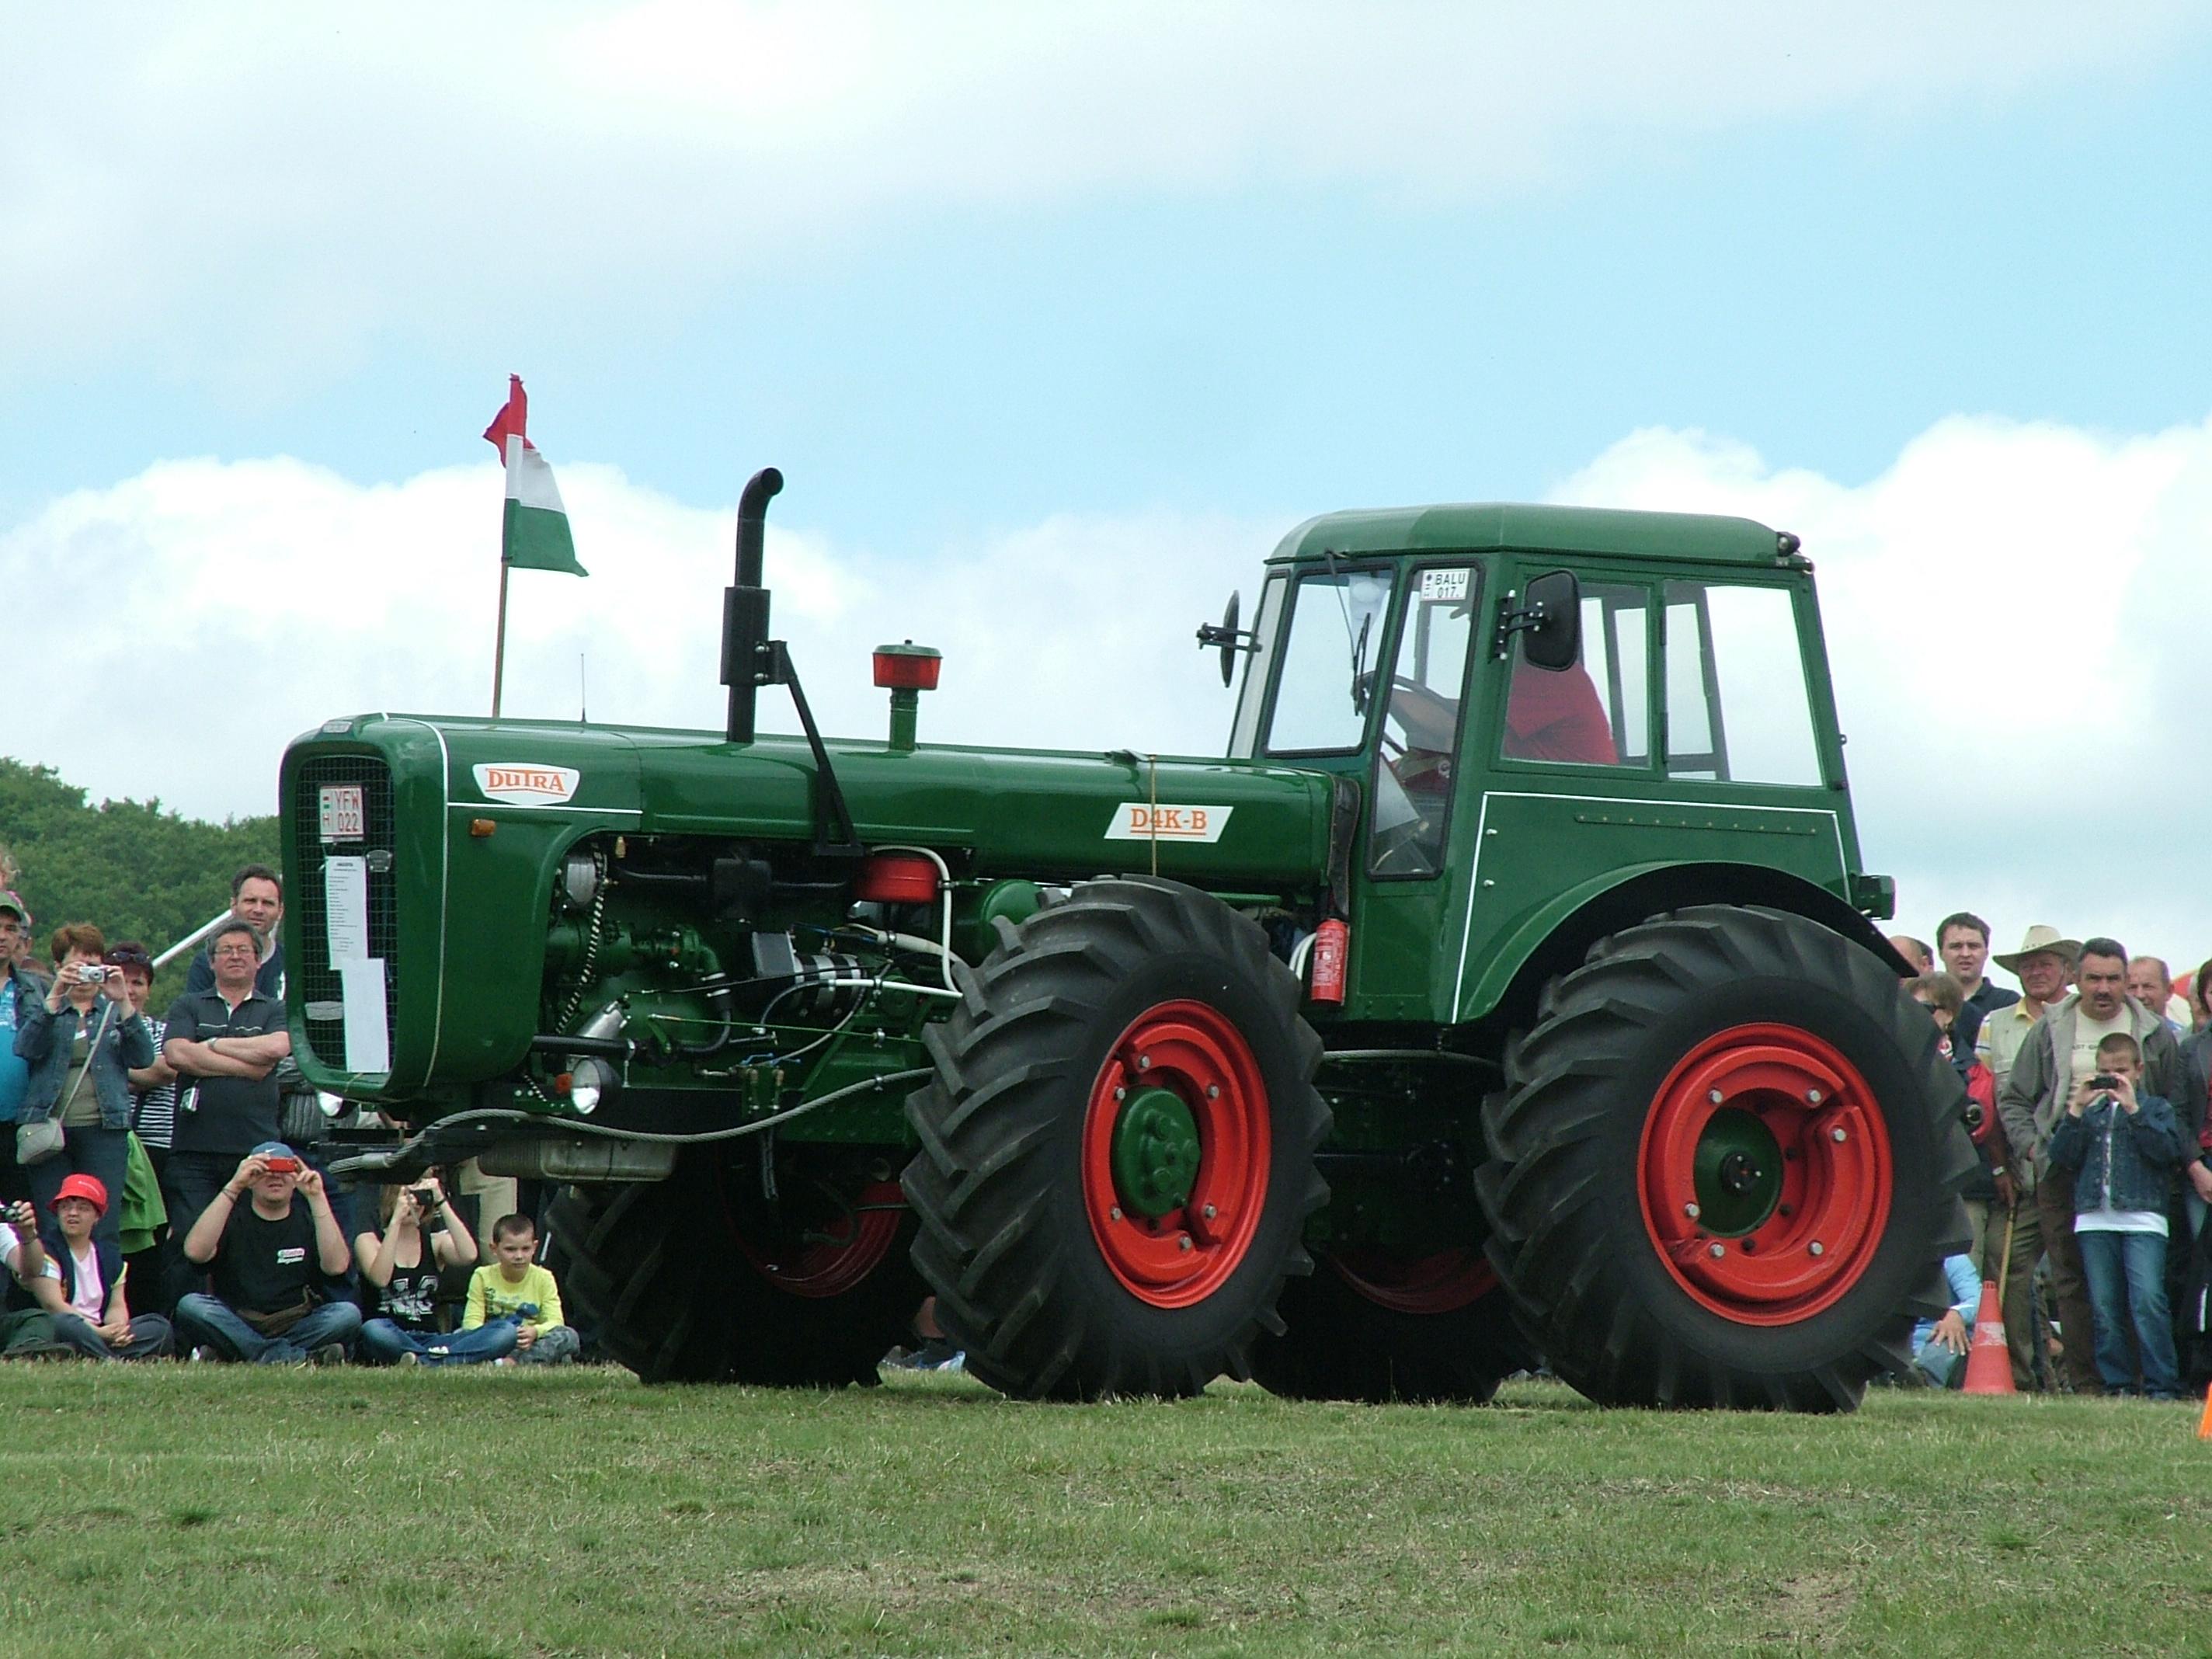 File:Dutra D4K-B, Bokor, Traktormajális 2012.jpg - Wikimedia Commons